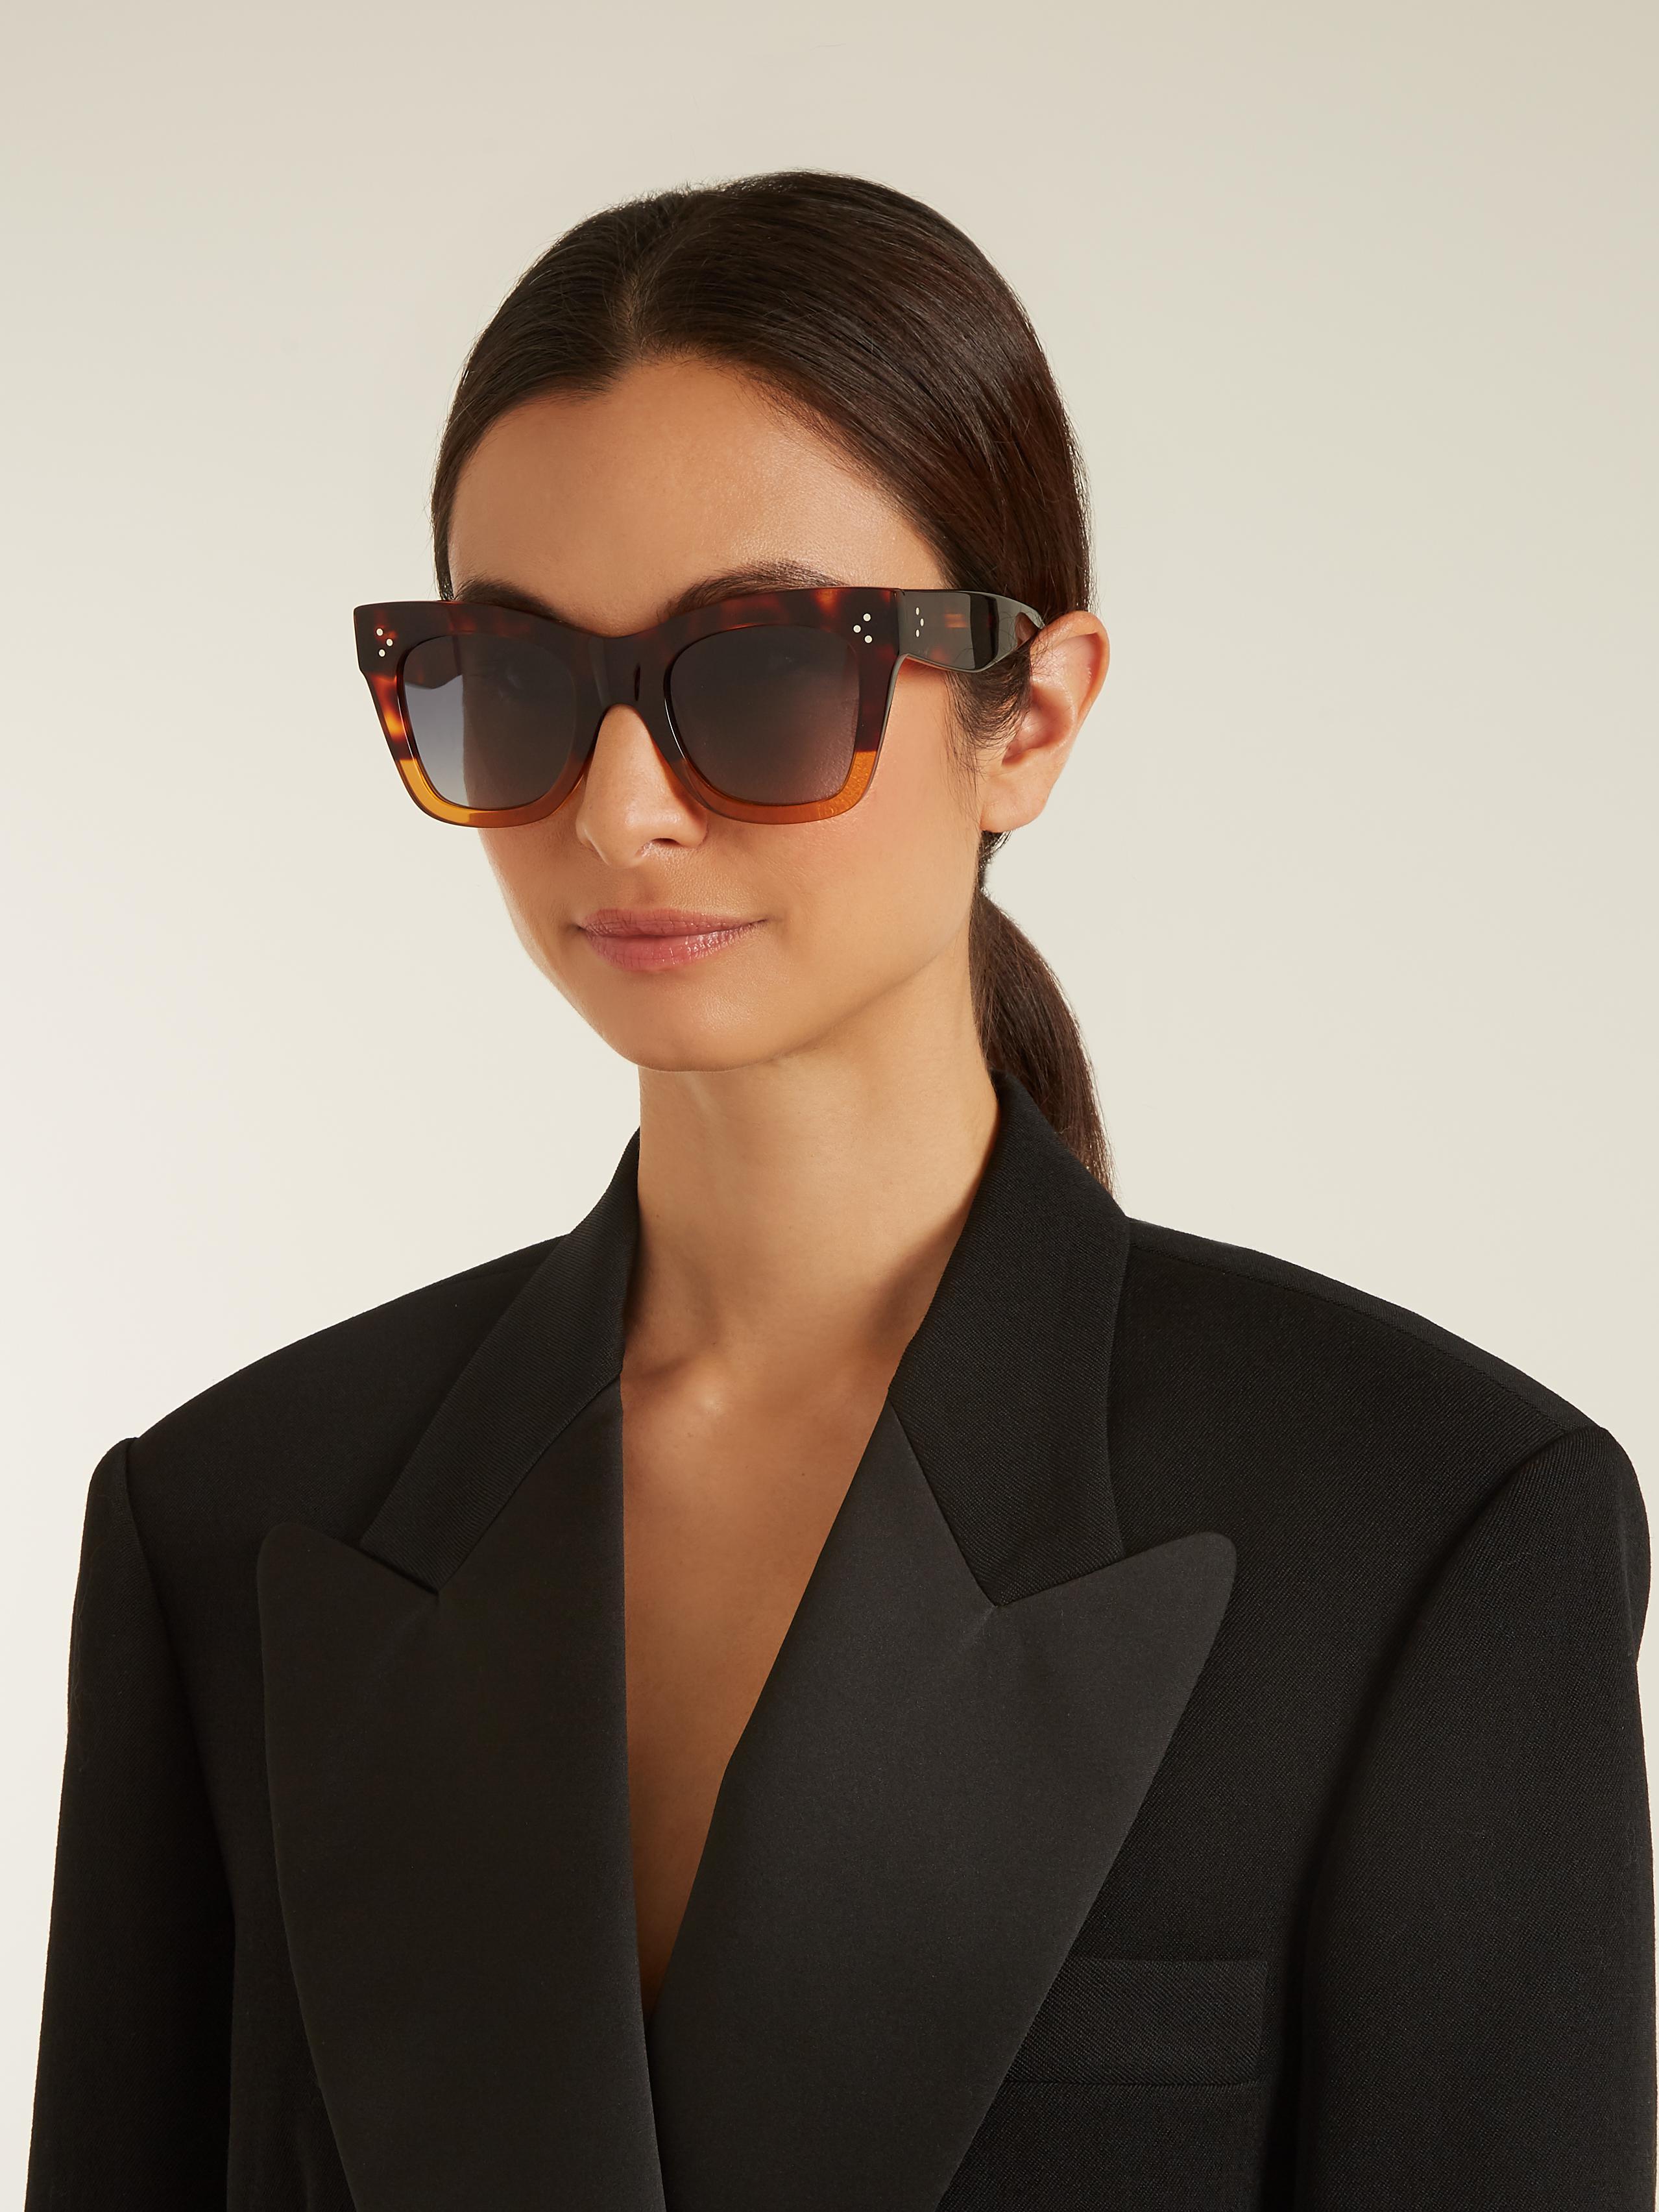 c54e271b012ed Sunglasses Cat Sunglasses Celine Sunglasses Acetate Cat eye Acetate eye  Acetate Cat Acetate eye Celine Celine ...